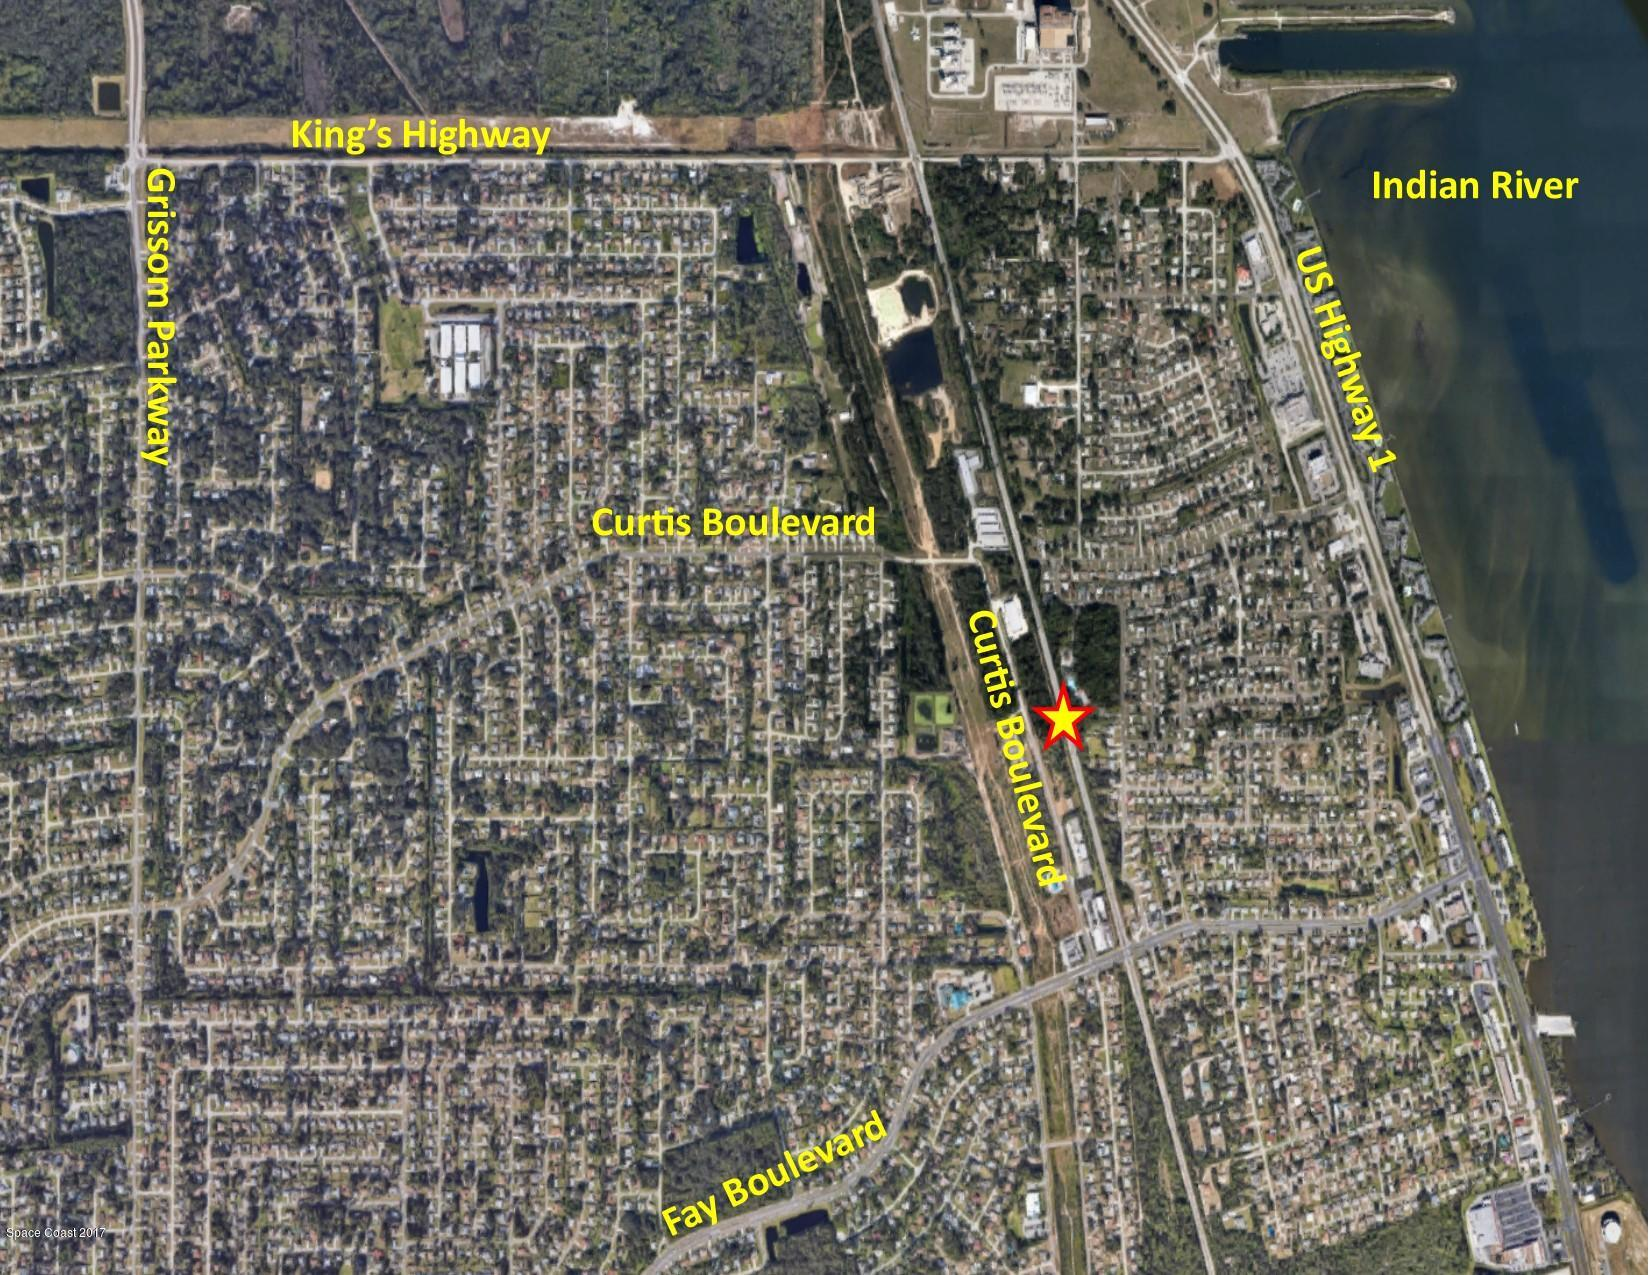 3810 Curtis Boulevard # 1110, Cocoa FL 32927 - Photo 1